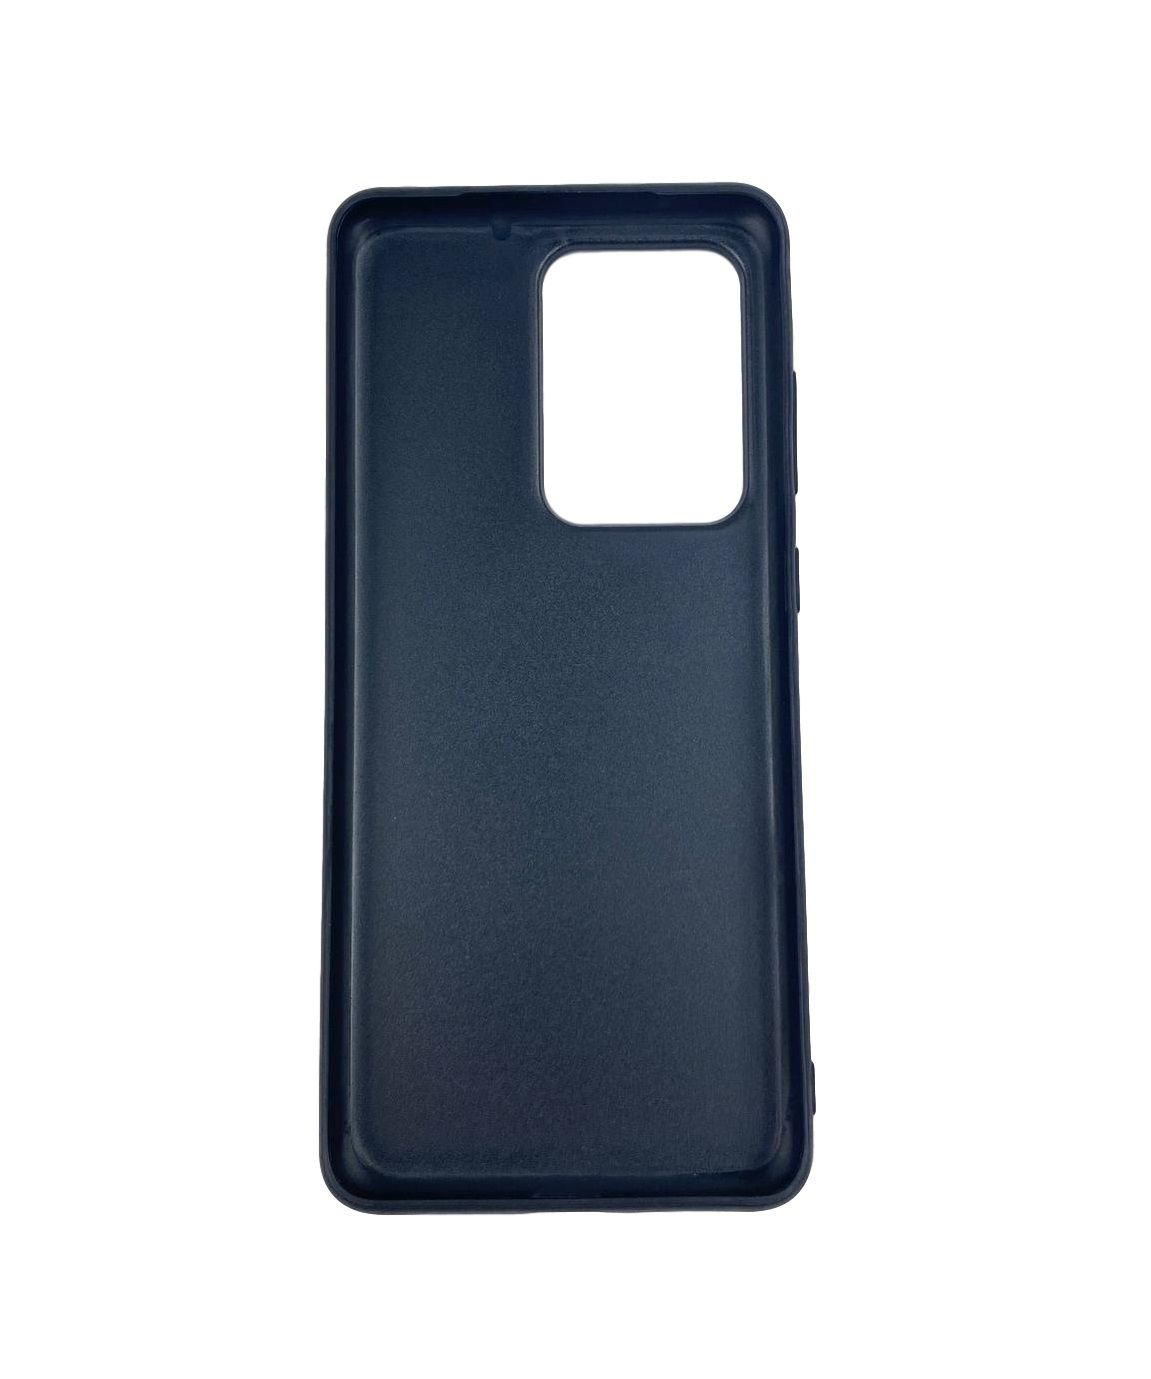 Husa Samsung S20 Ultra, X-level premium, piele ecologica, Gri - MobileWish